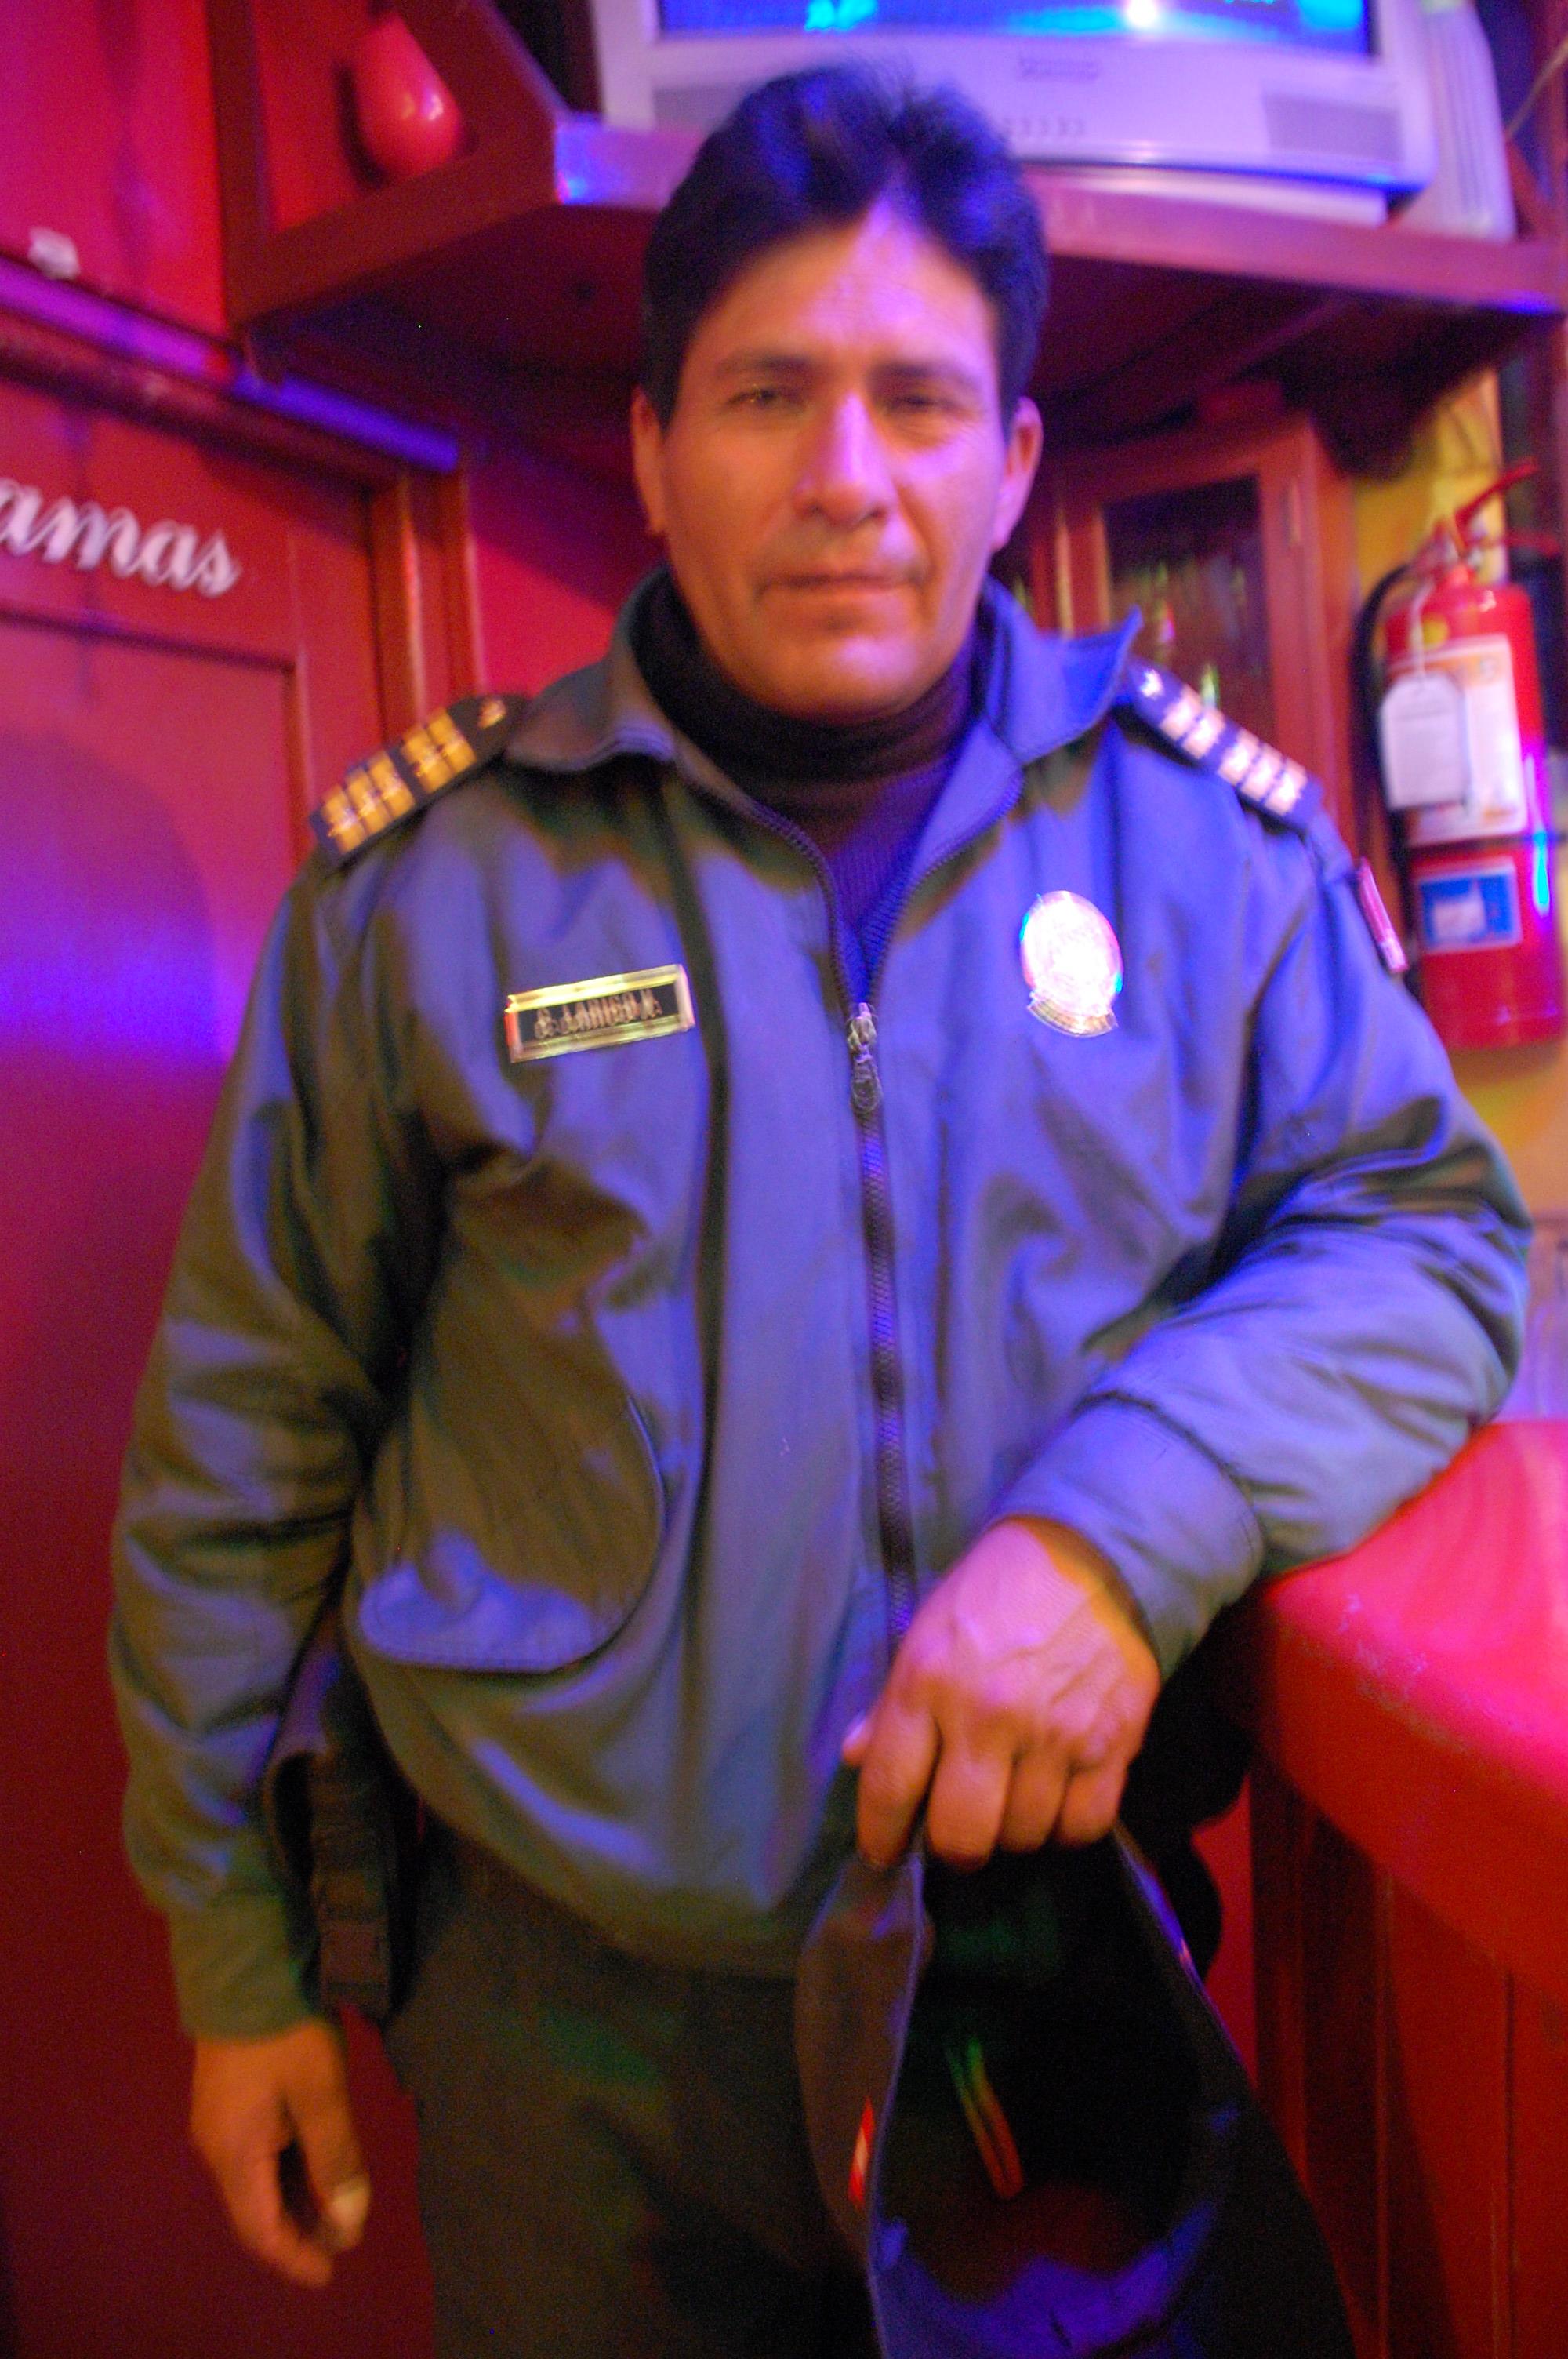 Peruvian police get-up